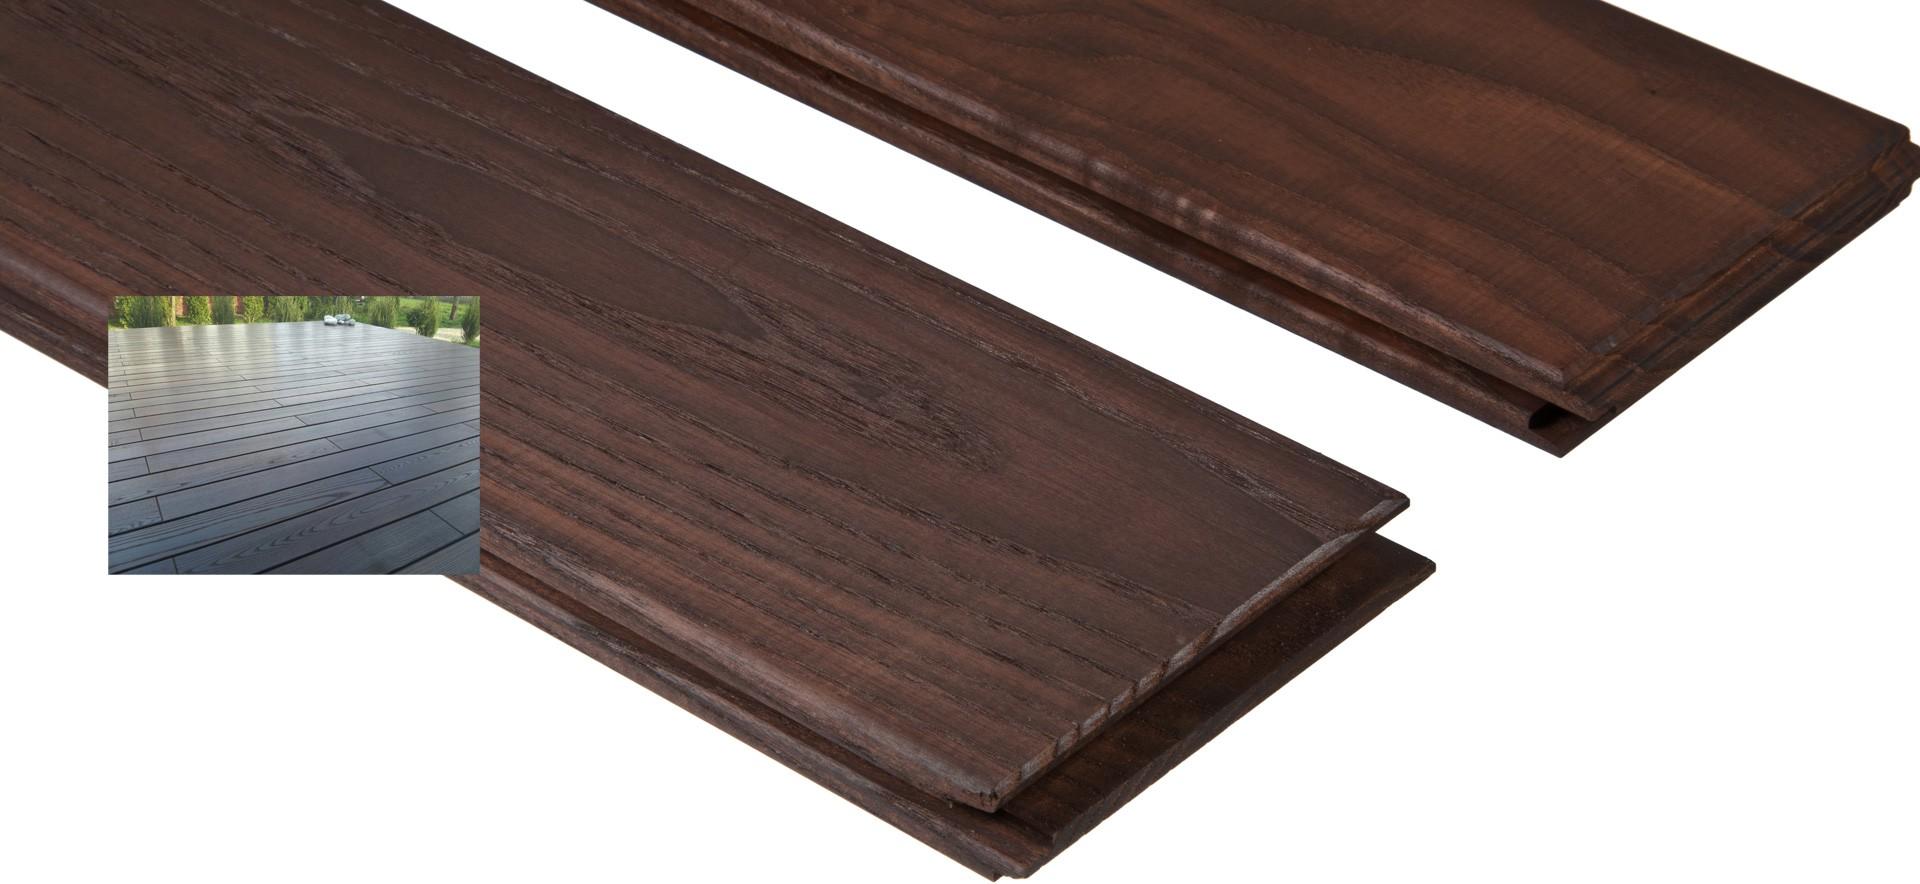 holzterrasse holzfassade parkettboden thermowoodmaster. Black Bedroom Furniture Sets. Home Design Ideas